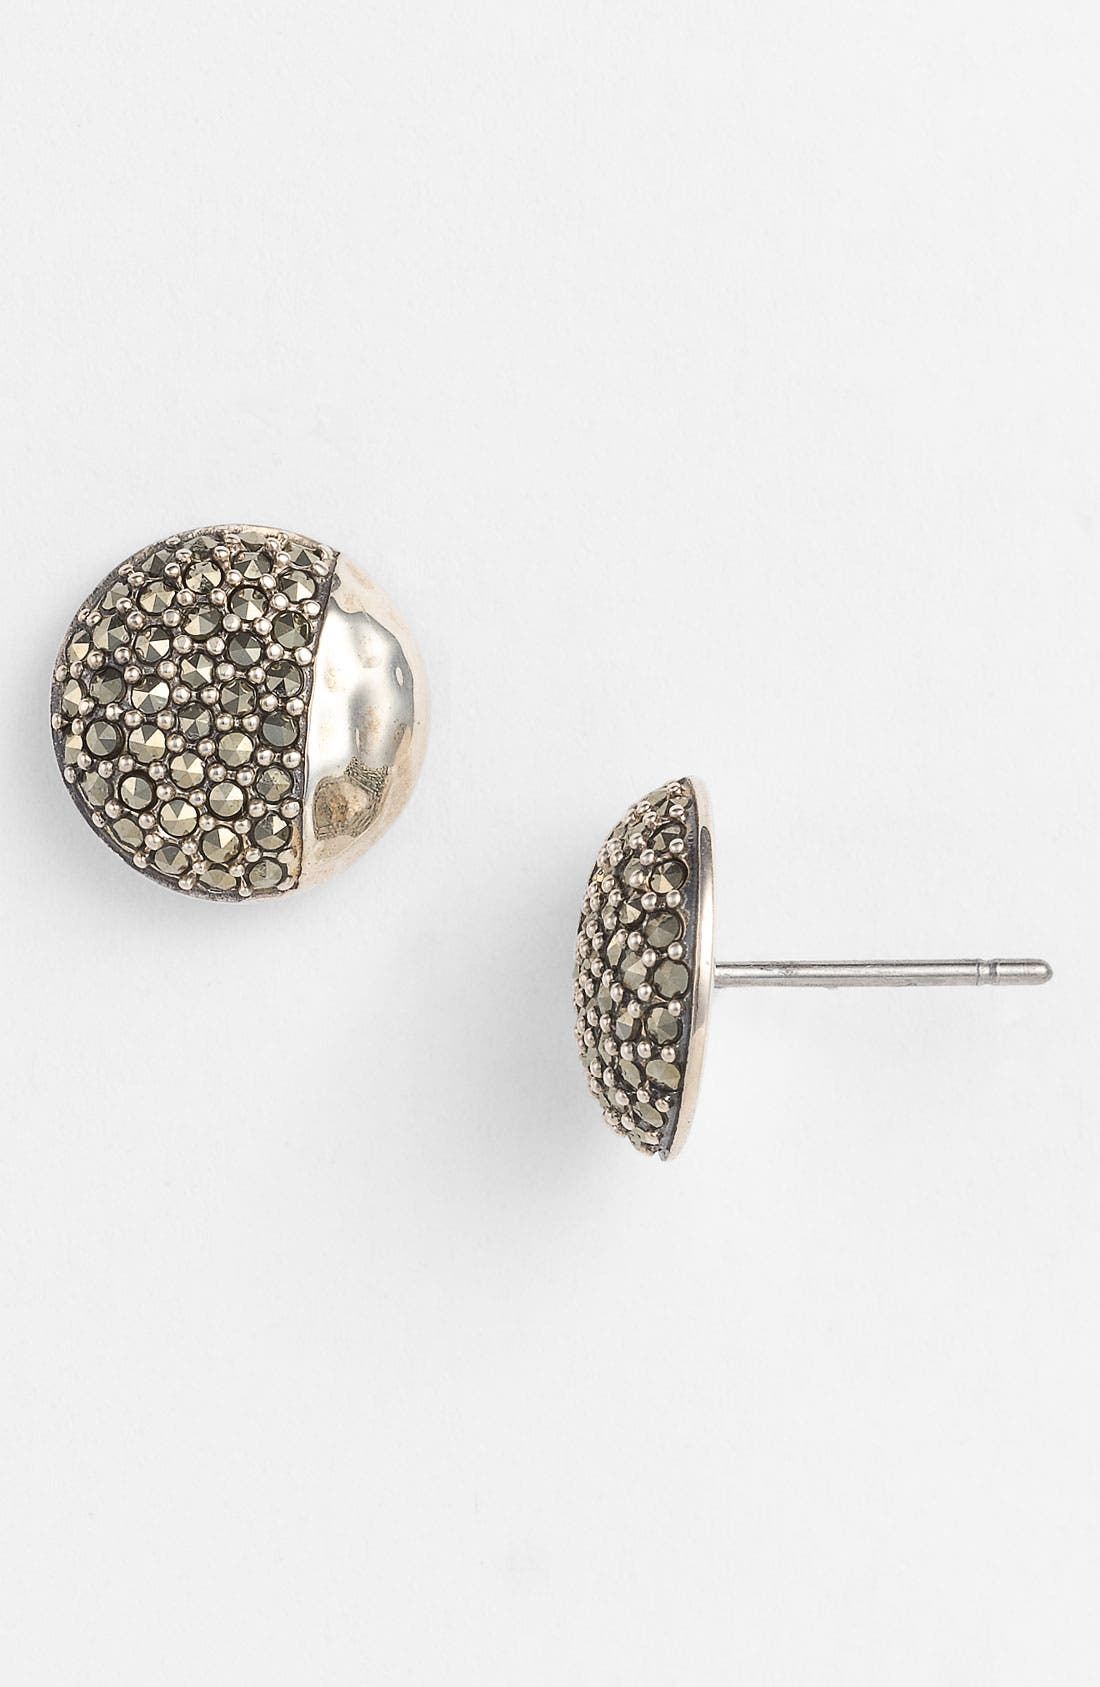 Alternate Image 1 Selected - Judith Jack 'Gold Sea' Button Stud Earrings